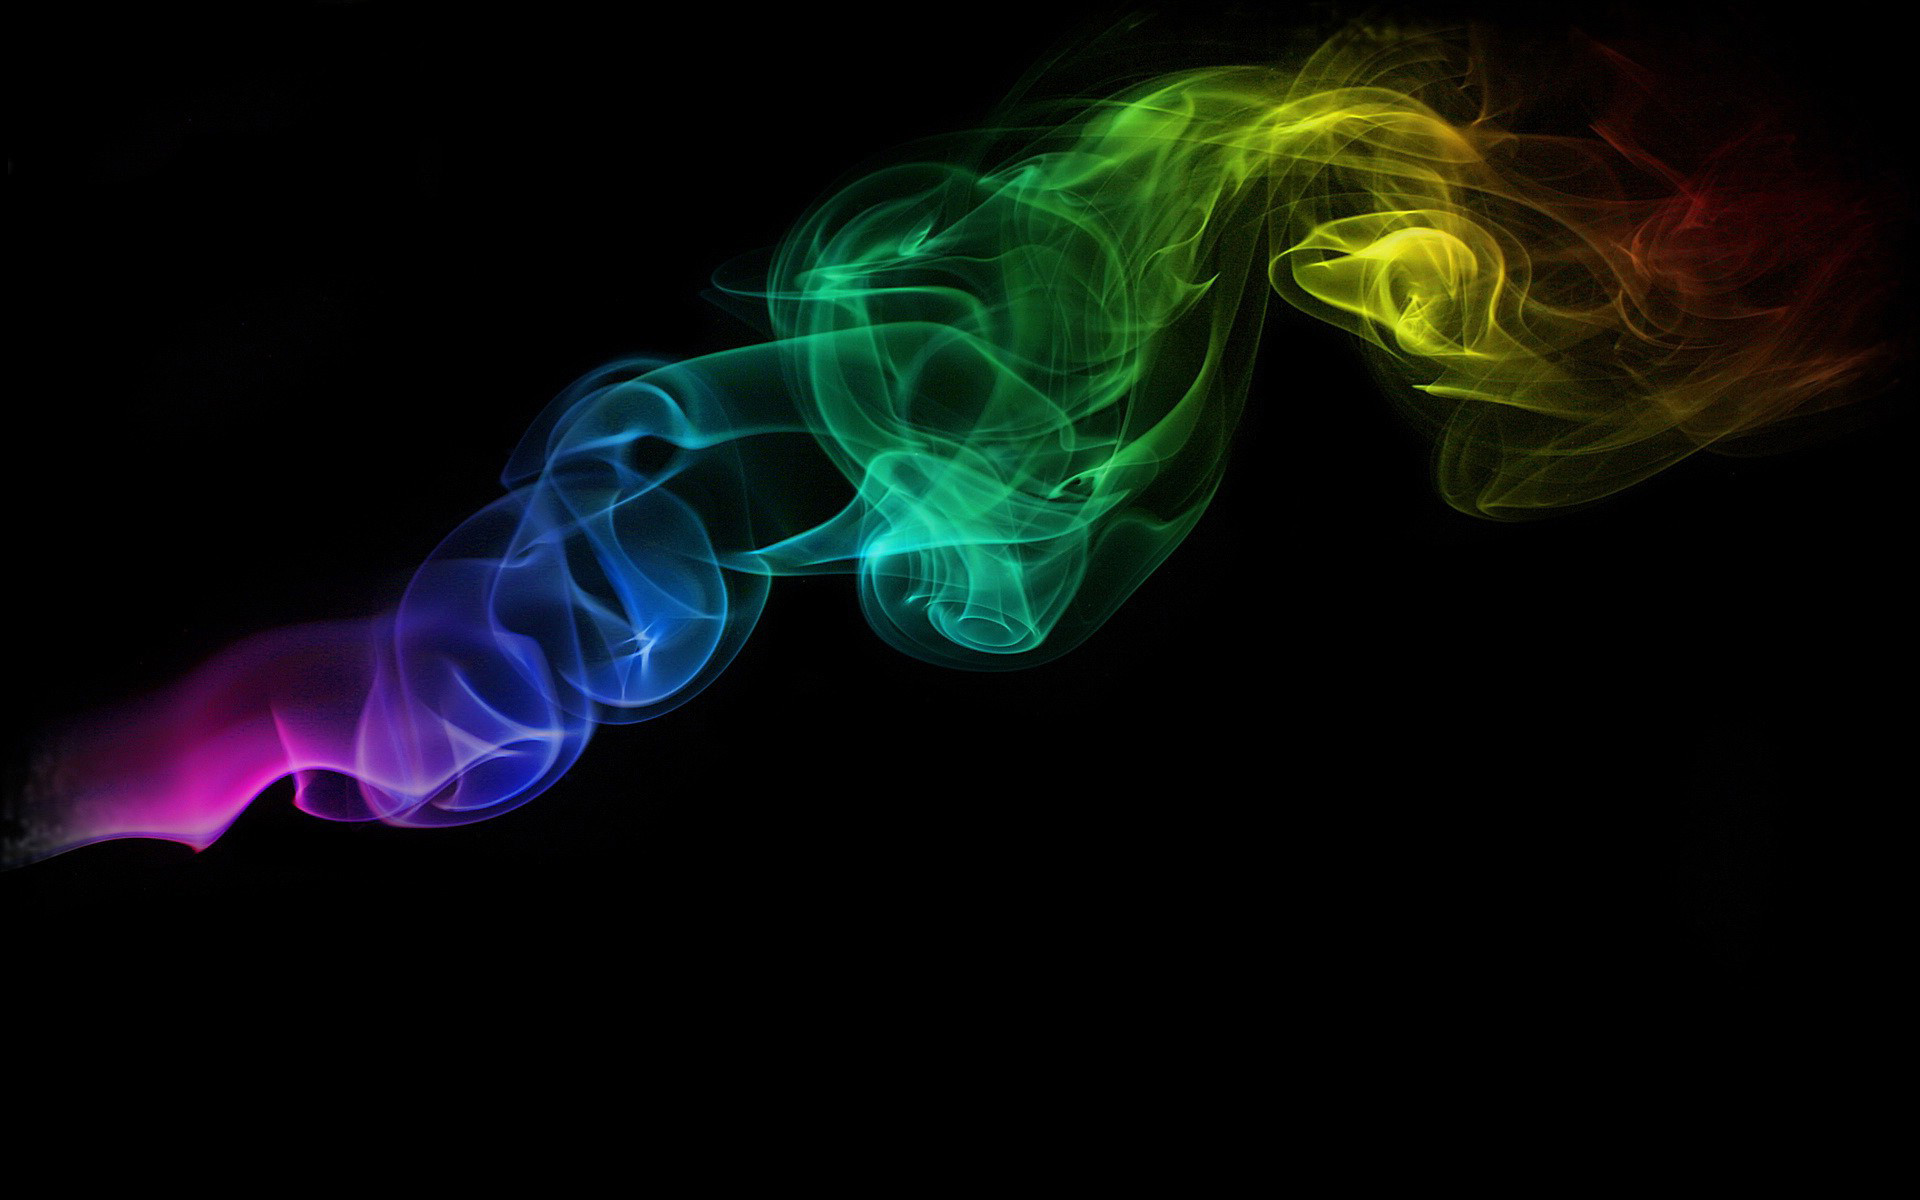 Color Smoke on a Black Background